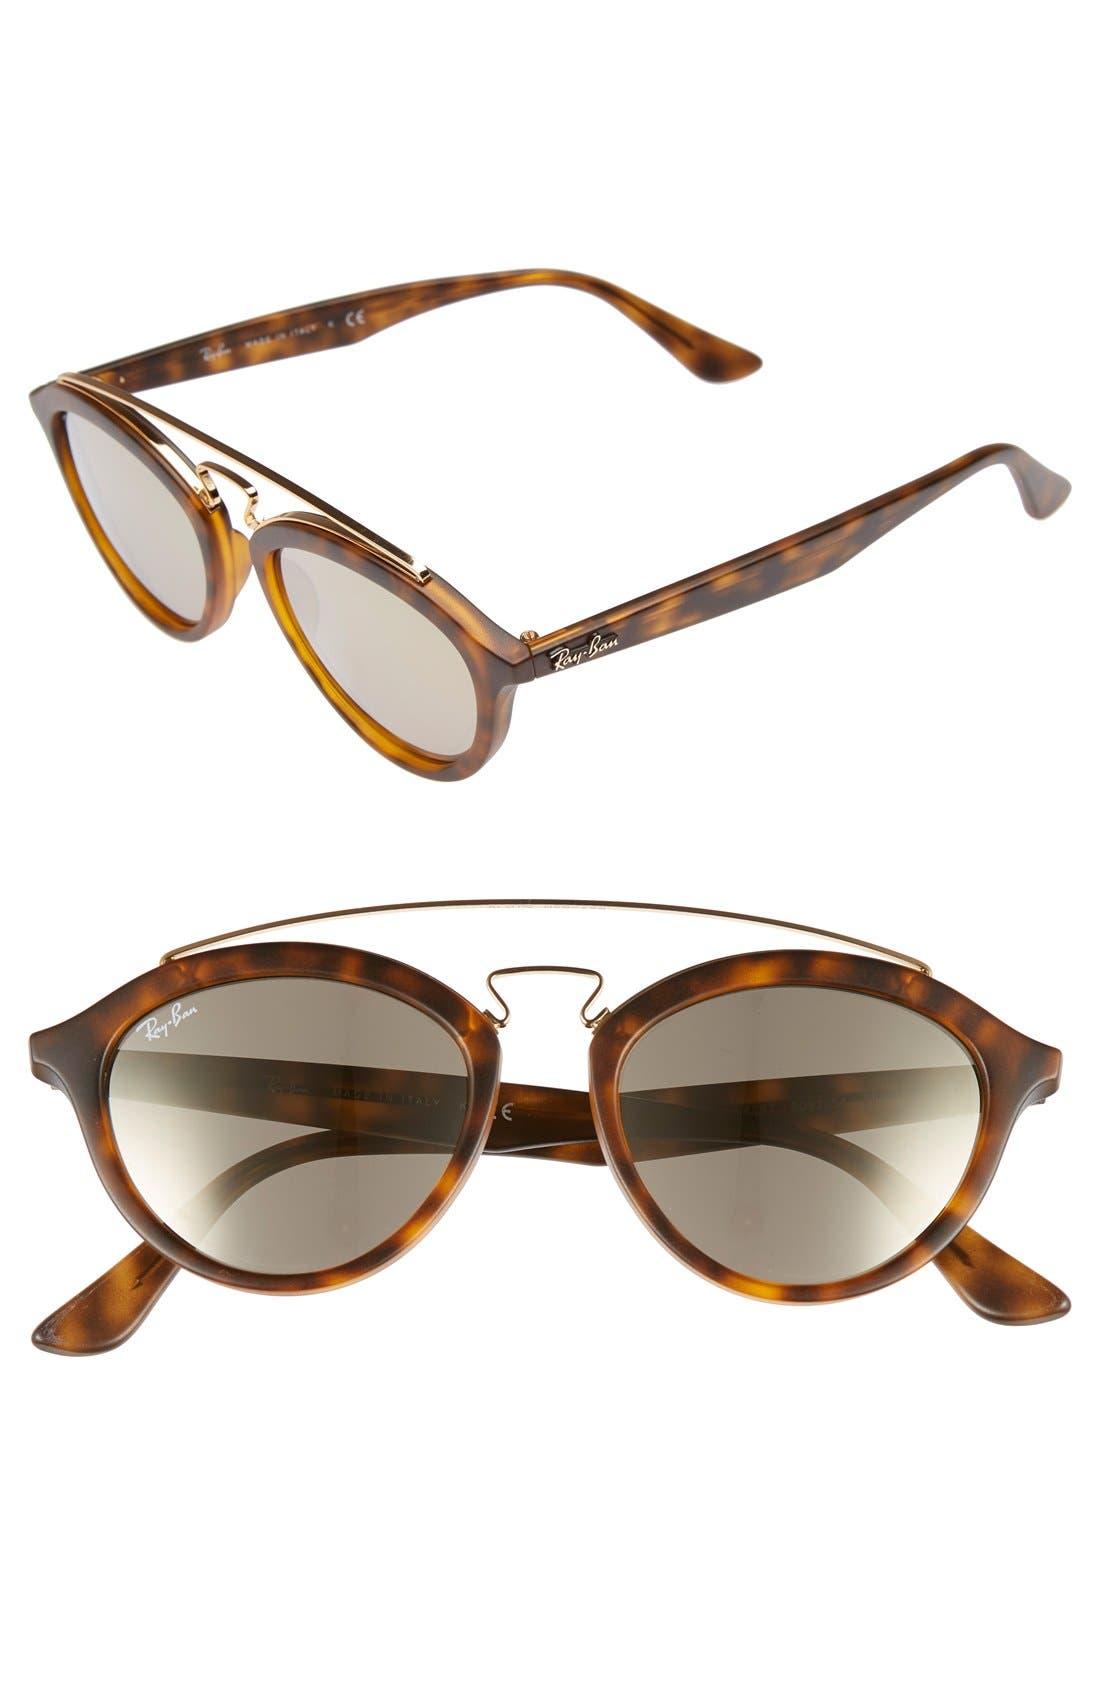 Highstreet 50mm Brow Bar Sunglasses,                             Main thumbnail 7, color,